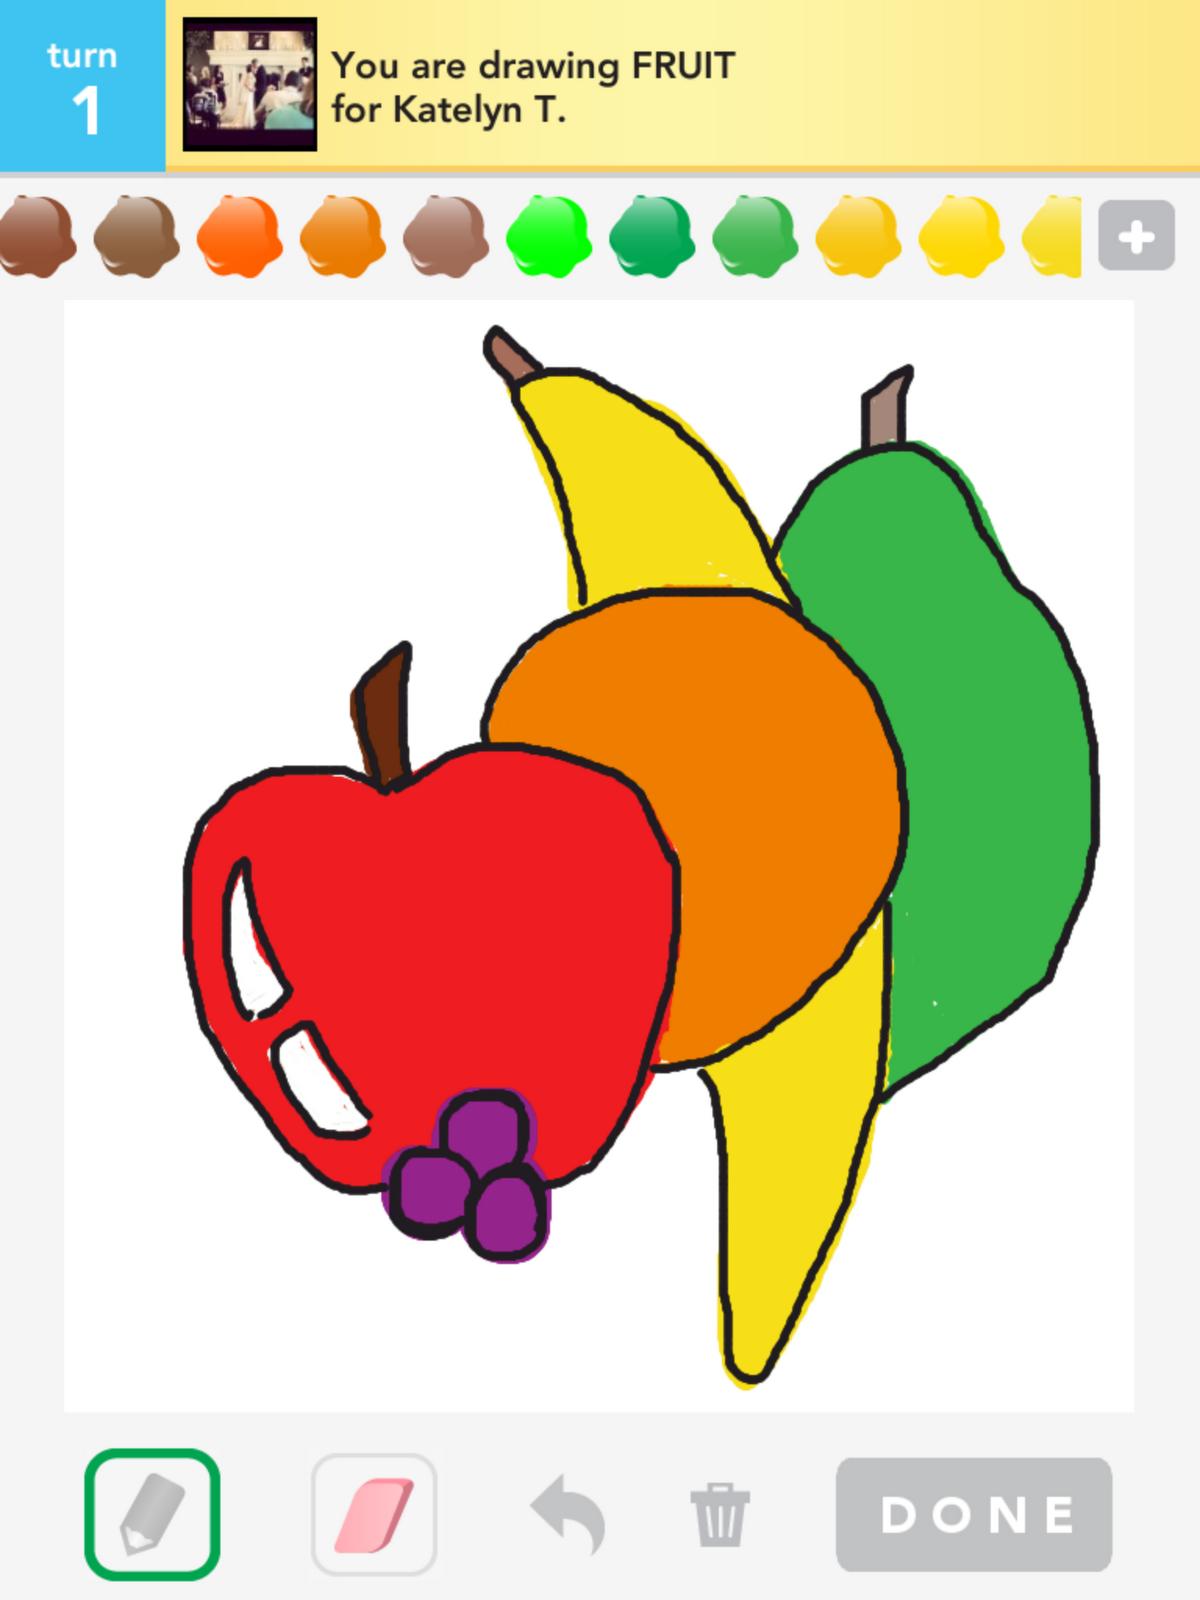 http://2.bp.blogspot.com/-De8_4xjnTjk/T6nQUwtQ1pI/AAAAAAAABNs/XuLqDBoskp4/s1600/Fruit+Draw+Something.PNG